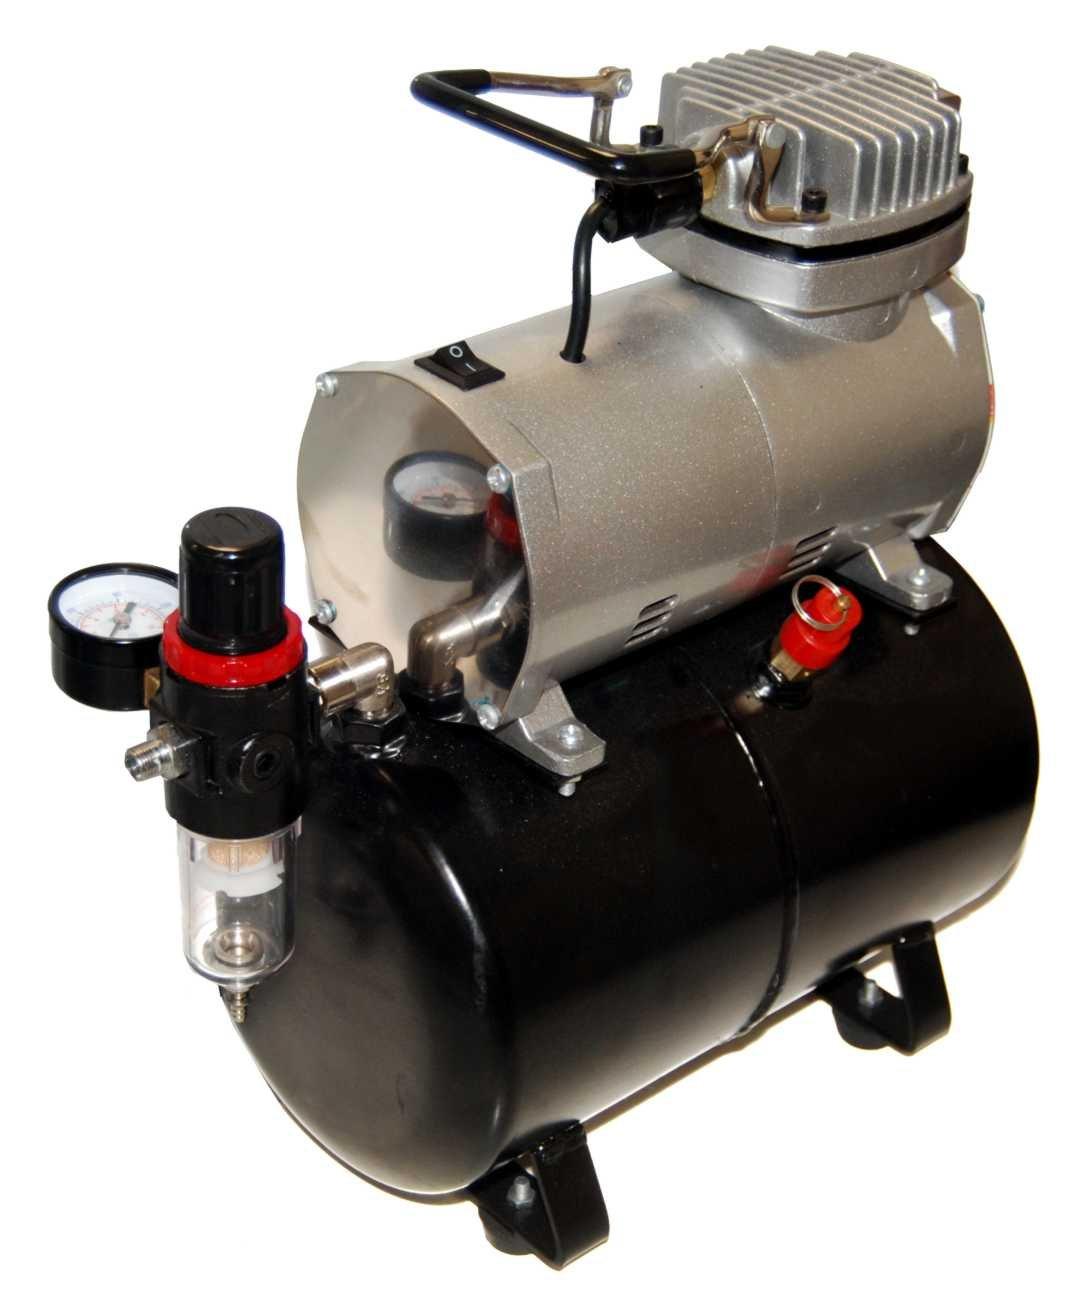 Master Multi-Purpose Deluxe Precision High Detail Control Master Airbrush Mod...